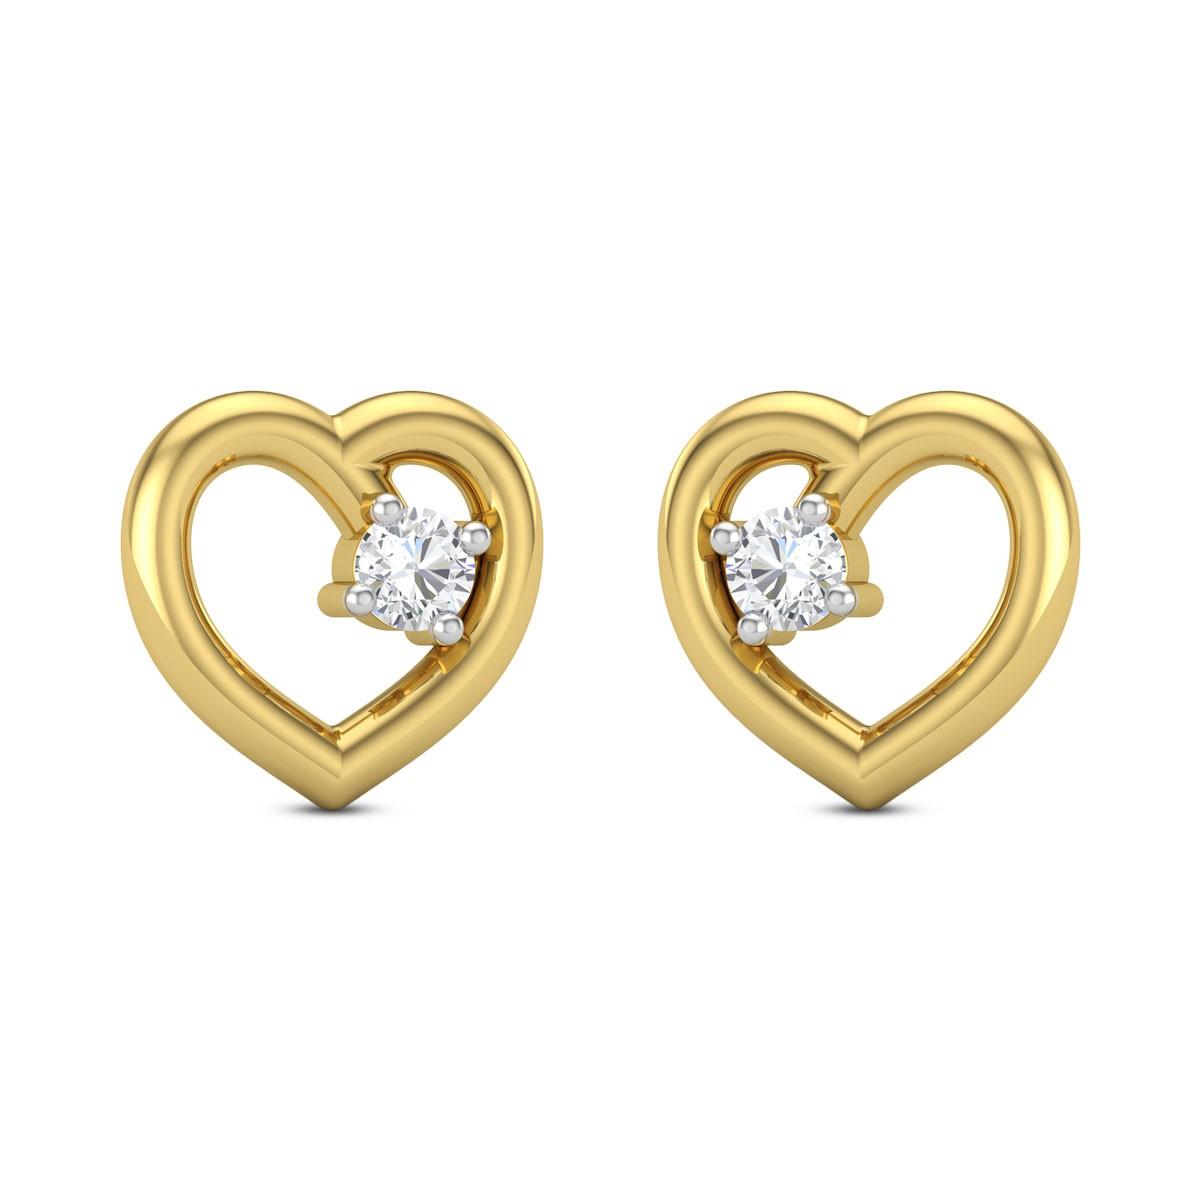 Arfa heart Diamond Earrings